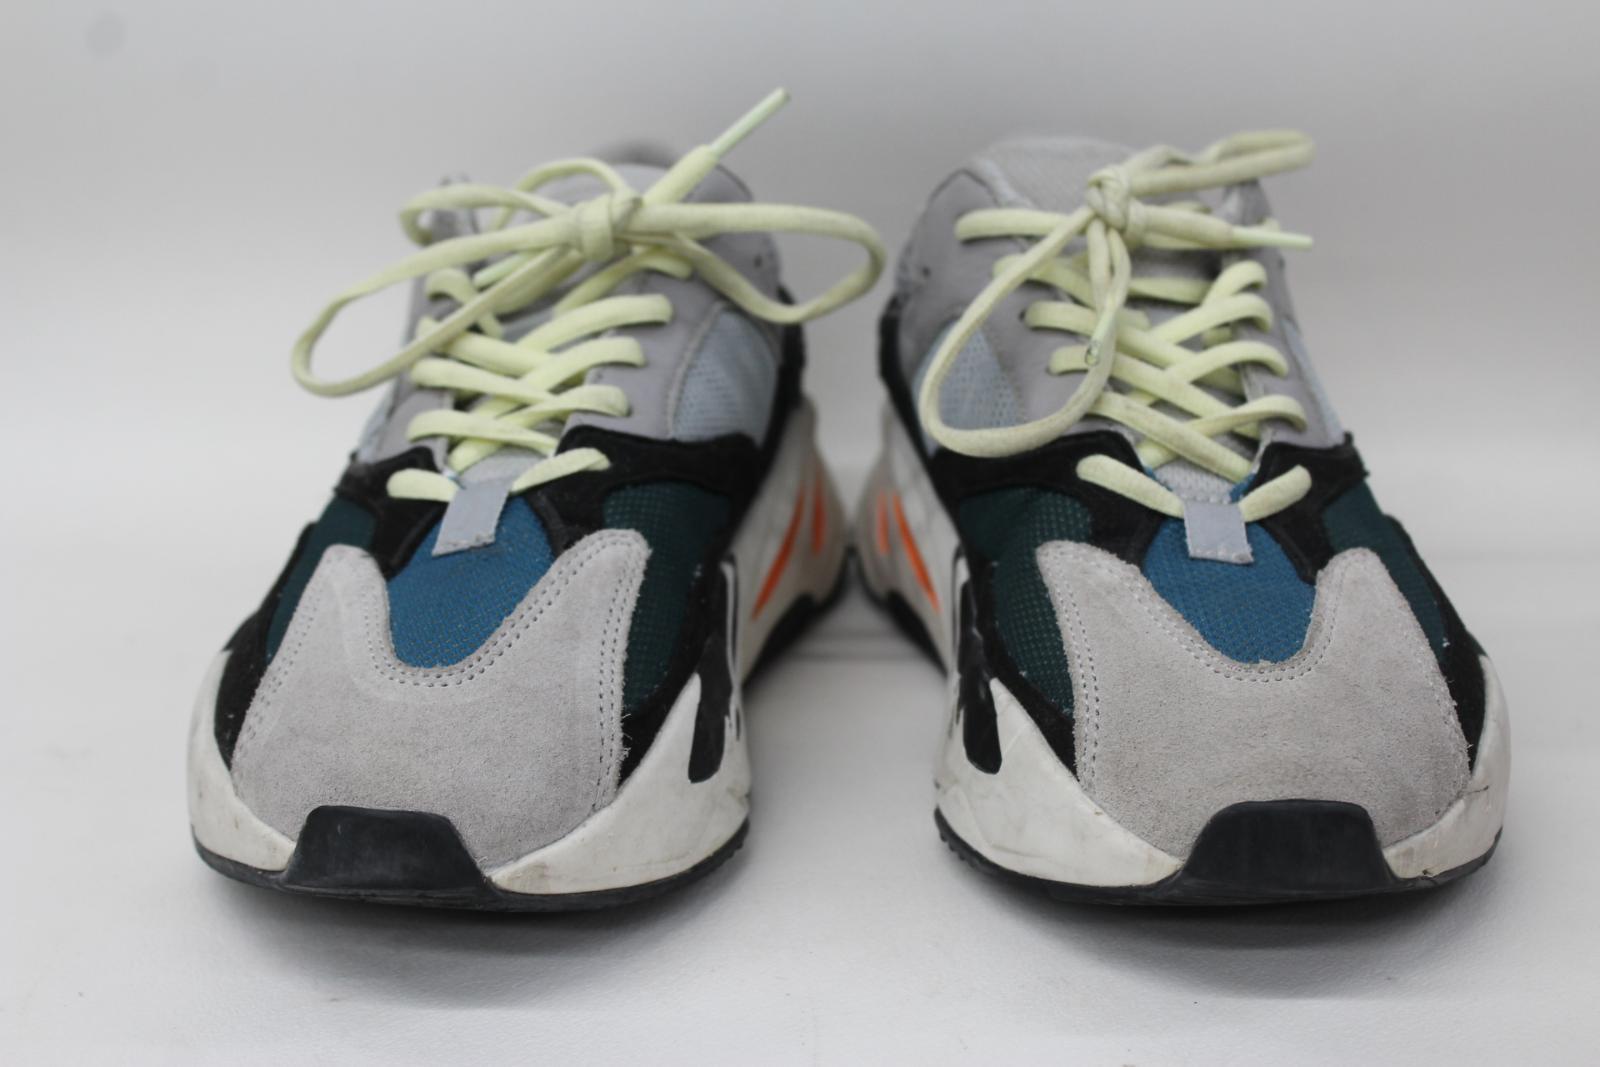 2 of 12 ADIDAS Yeezy Boost 700 Wave Runner Men s Suede   Mesh Trainers  UK7.5 EU41. db22931af